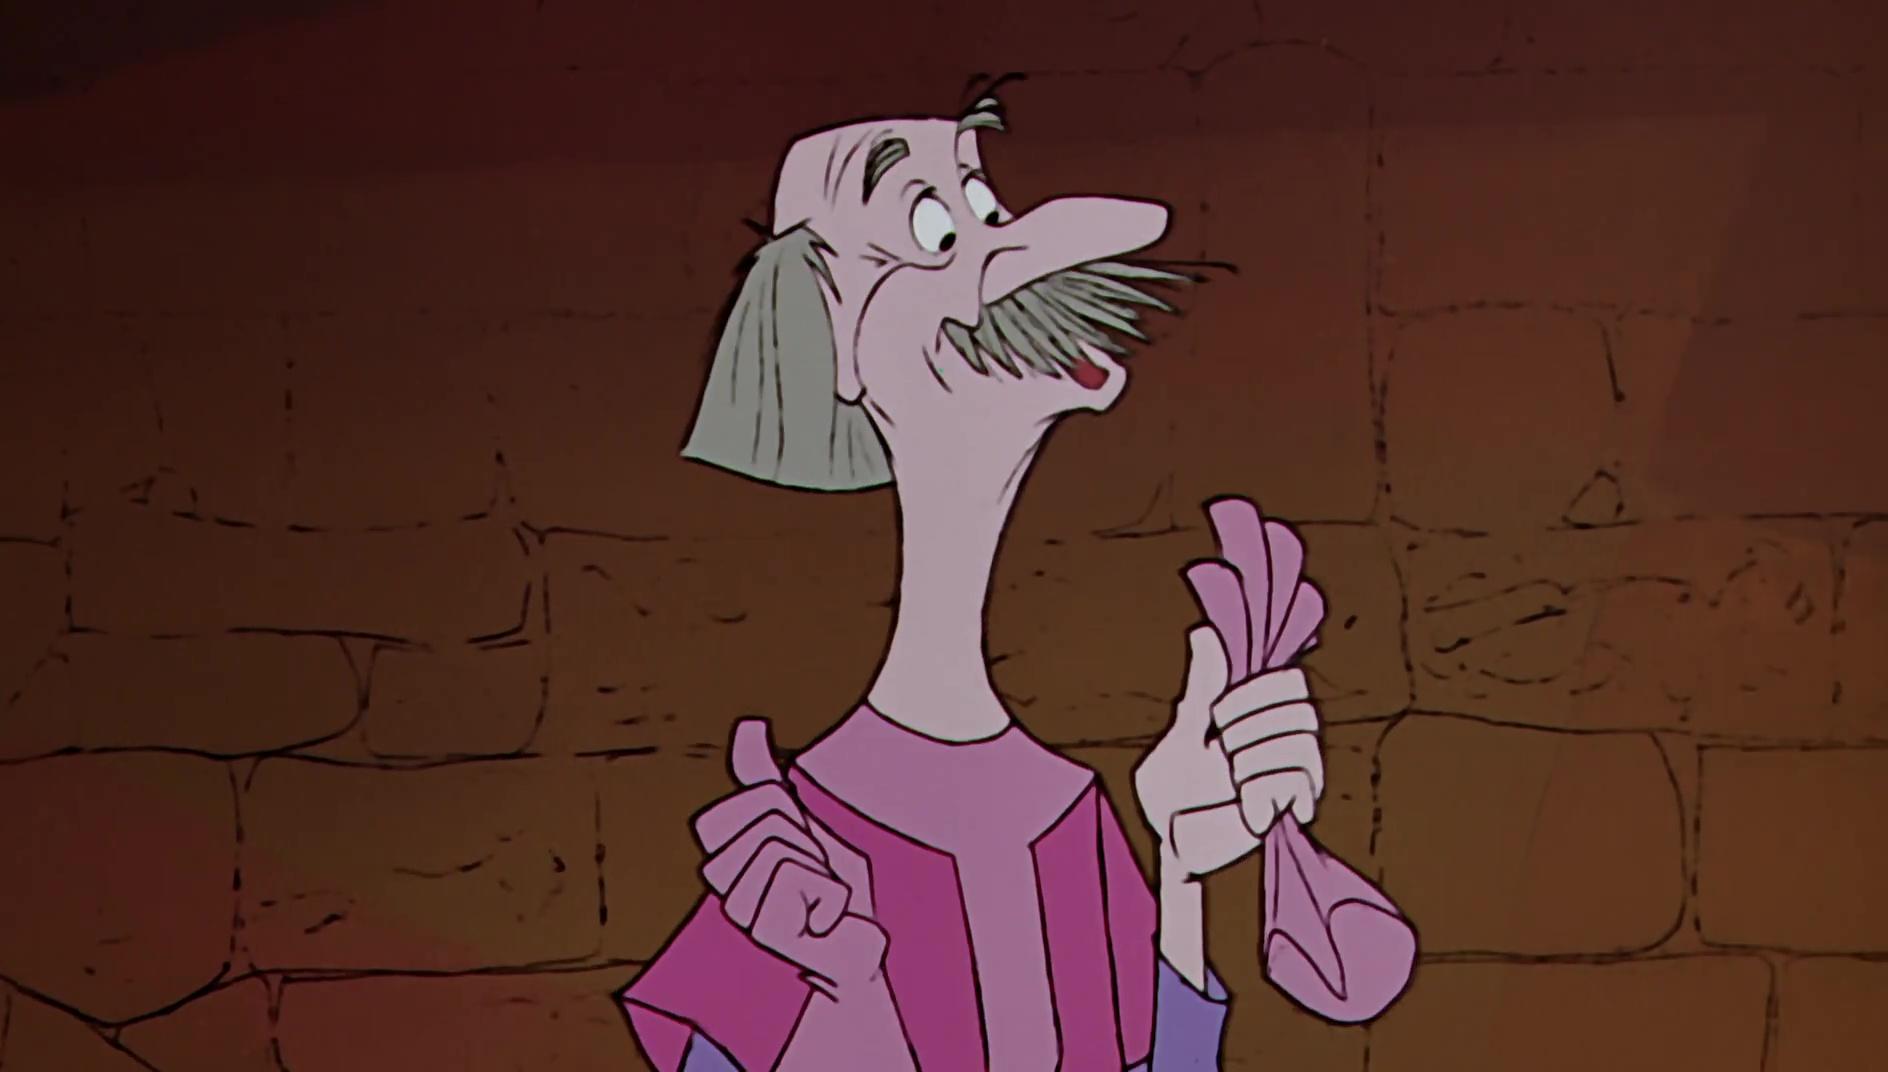 sire pélimore pellinore disney animation merlin enchanteur sword stone personnage character